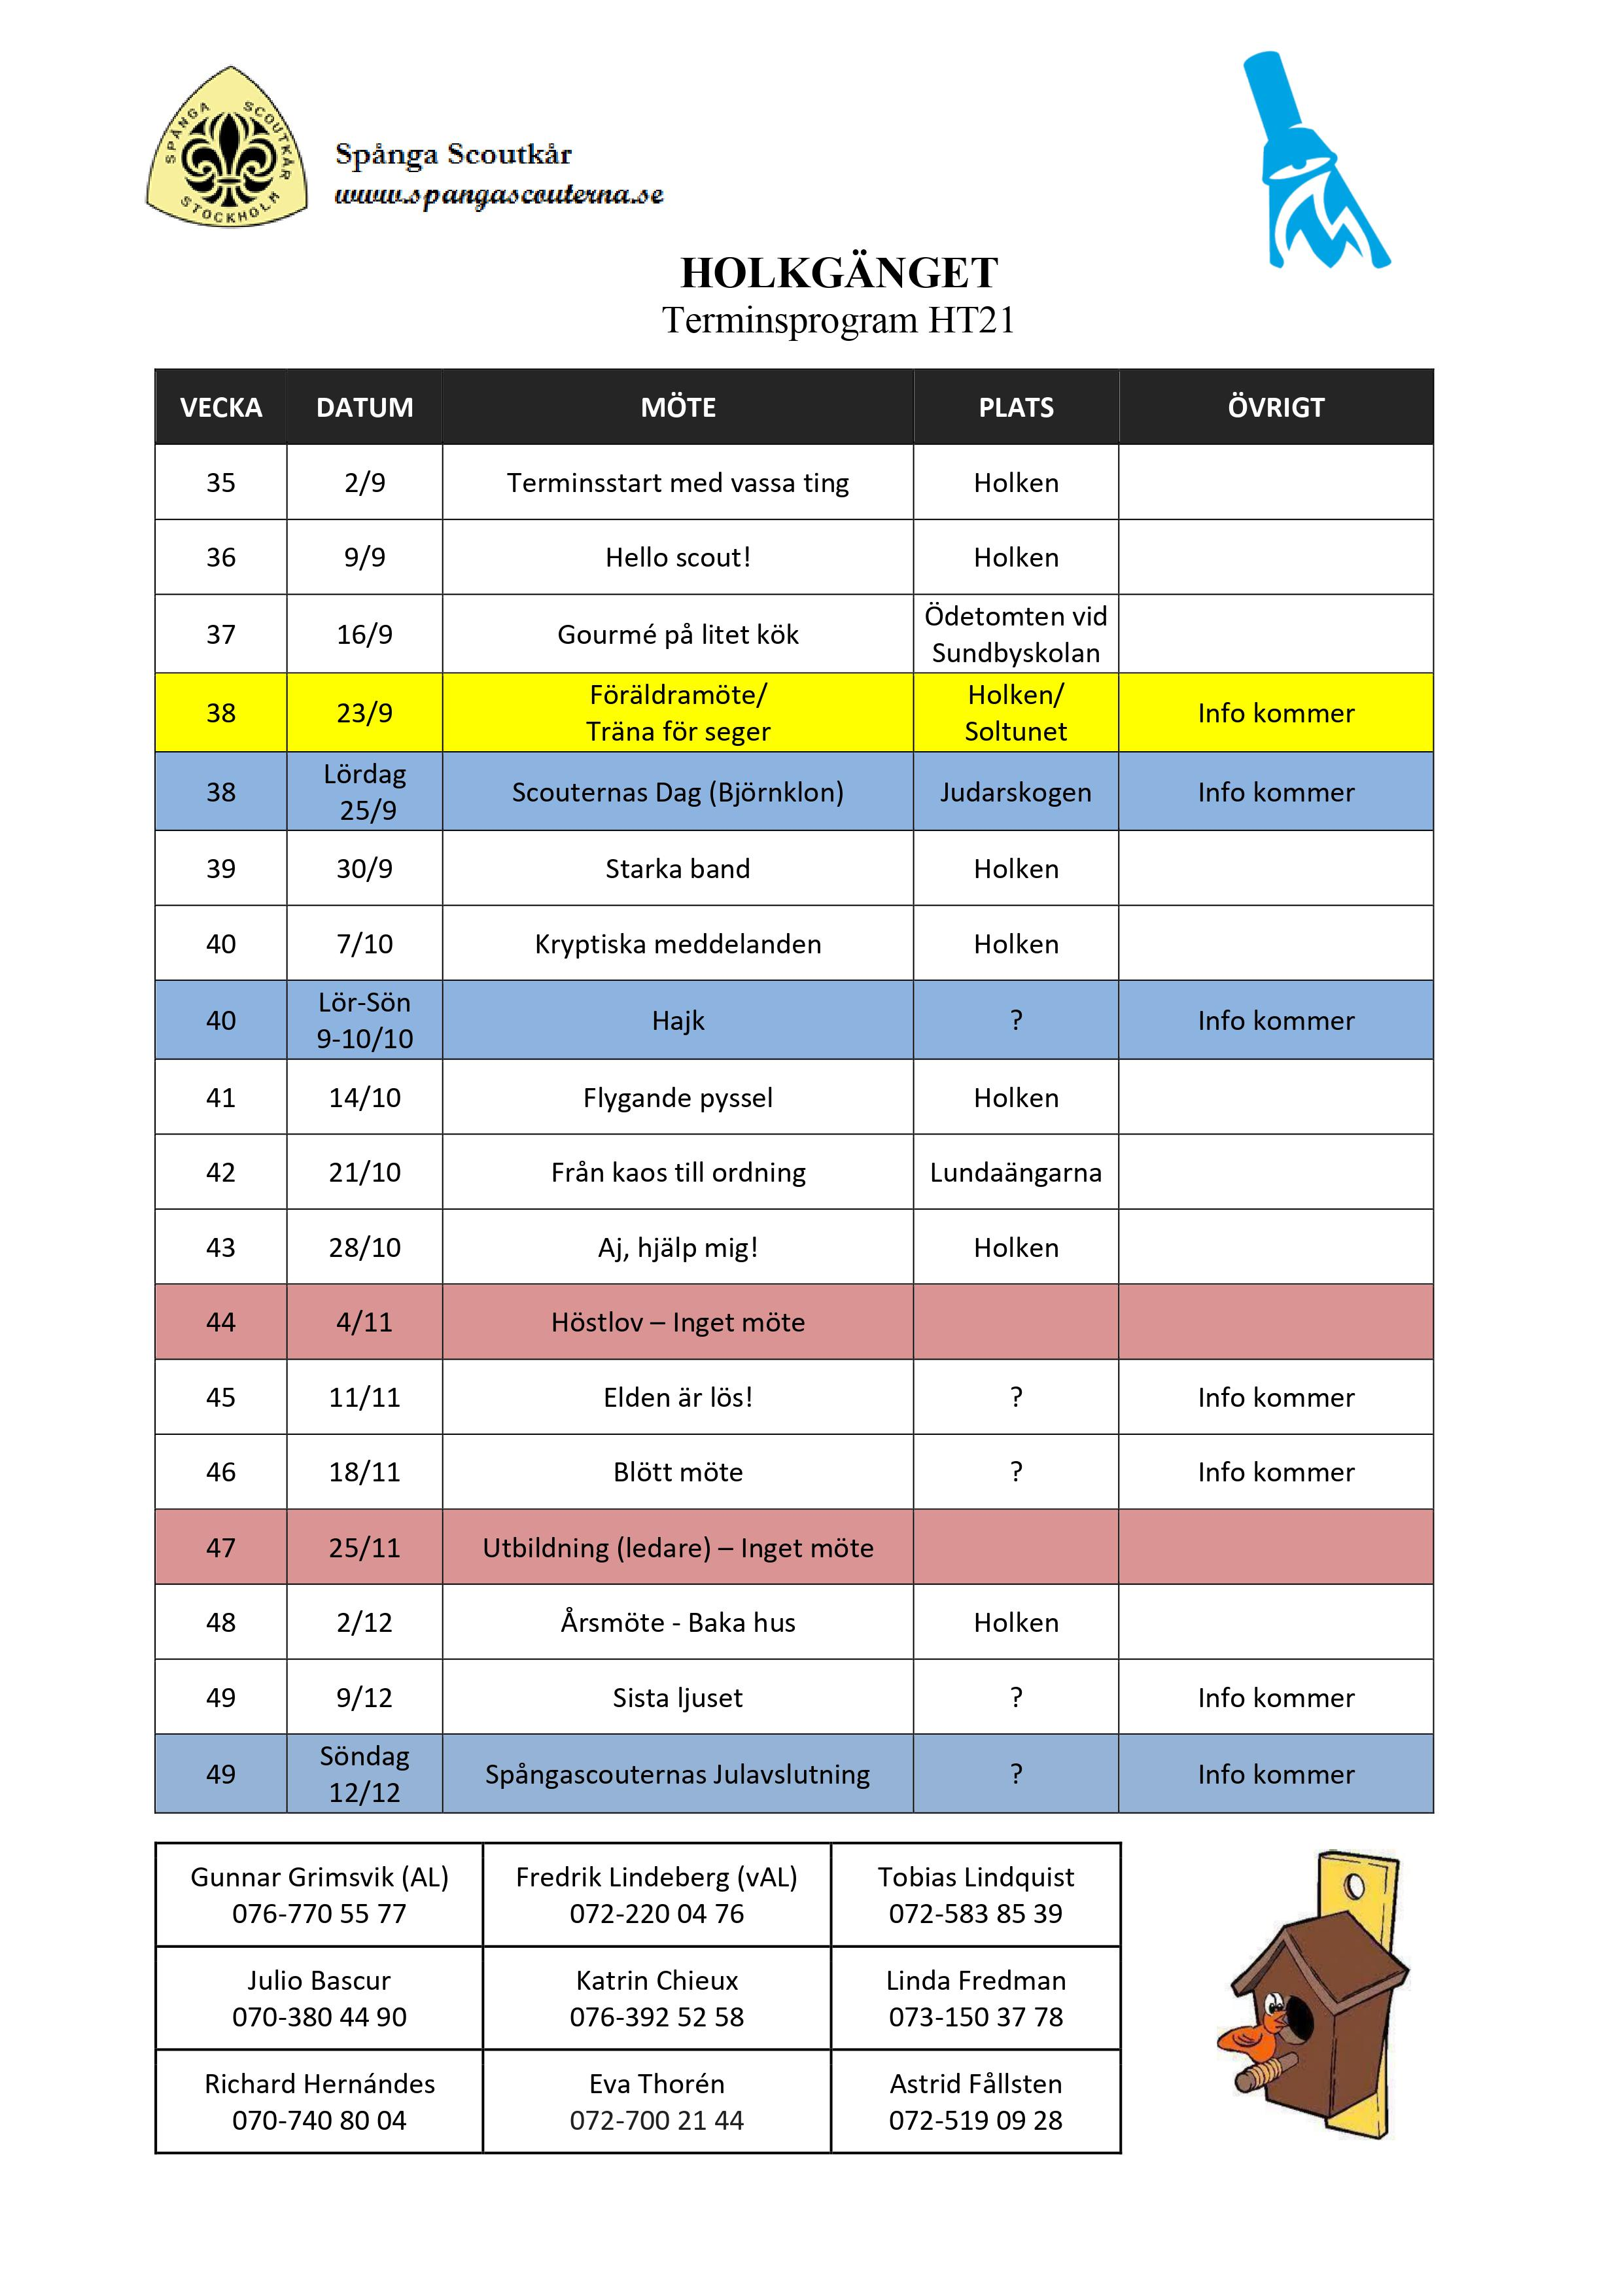 HT21 Terminsprogram Holkgänget scouterna version